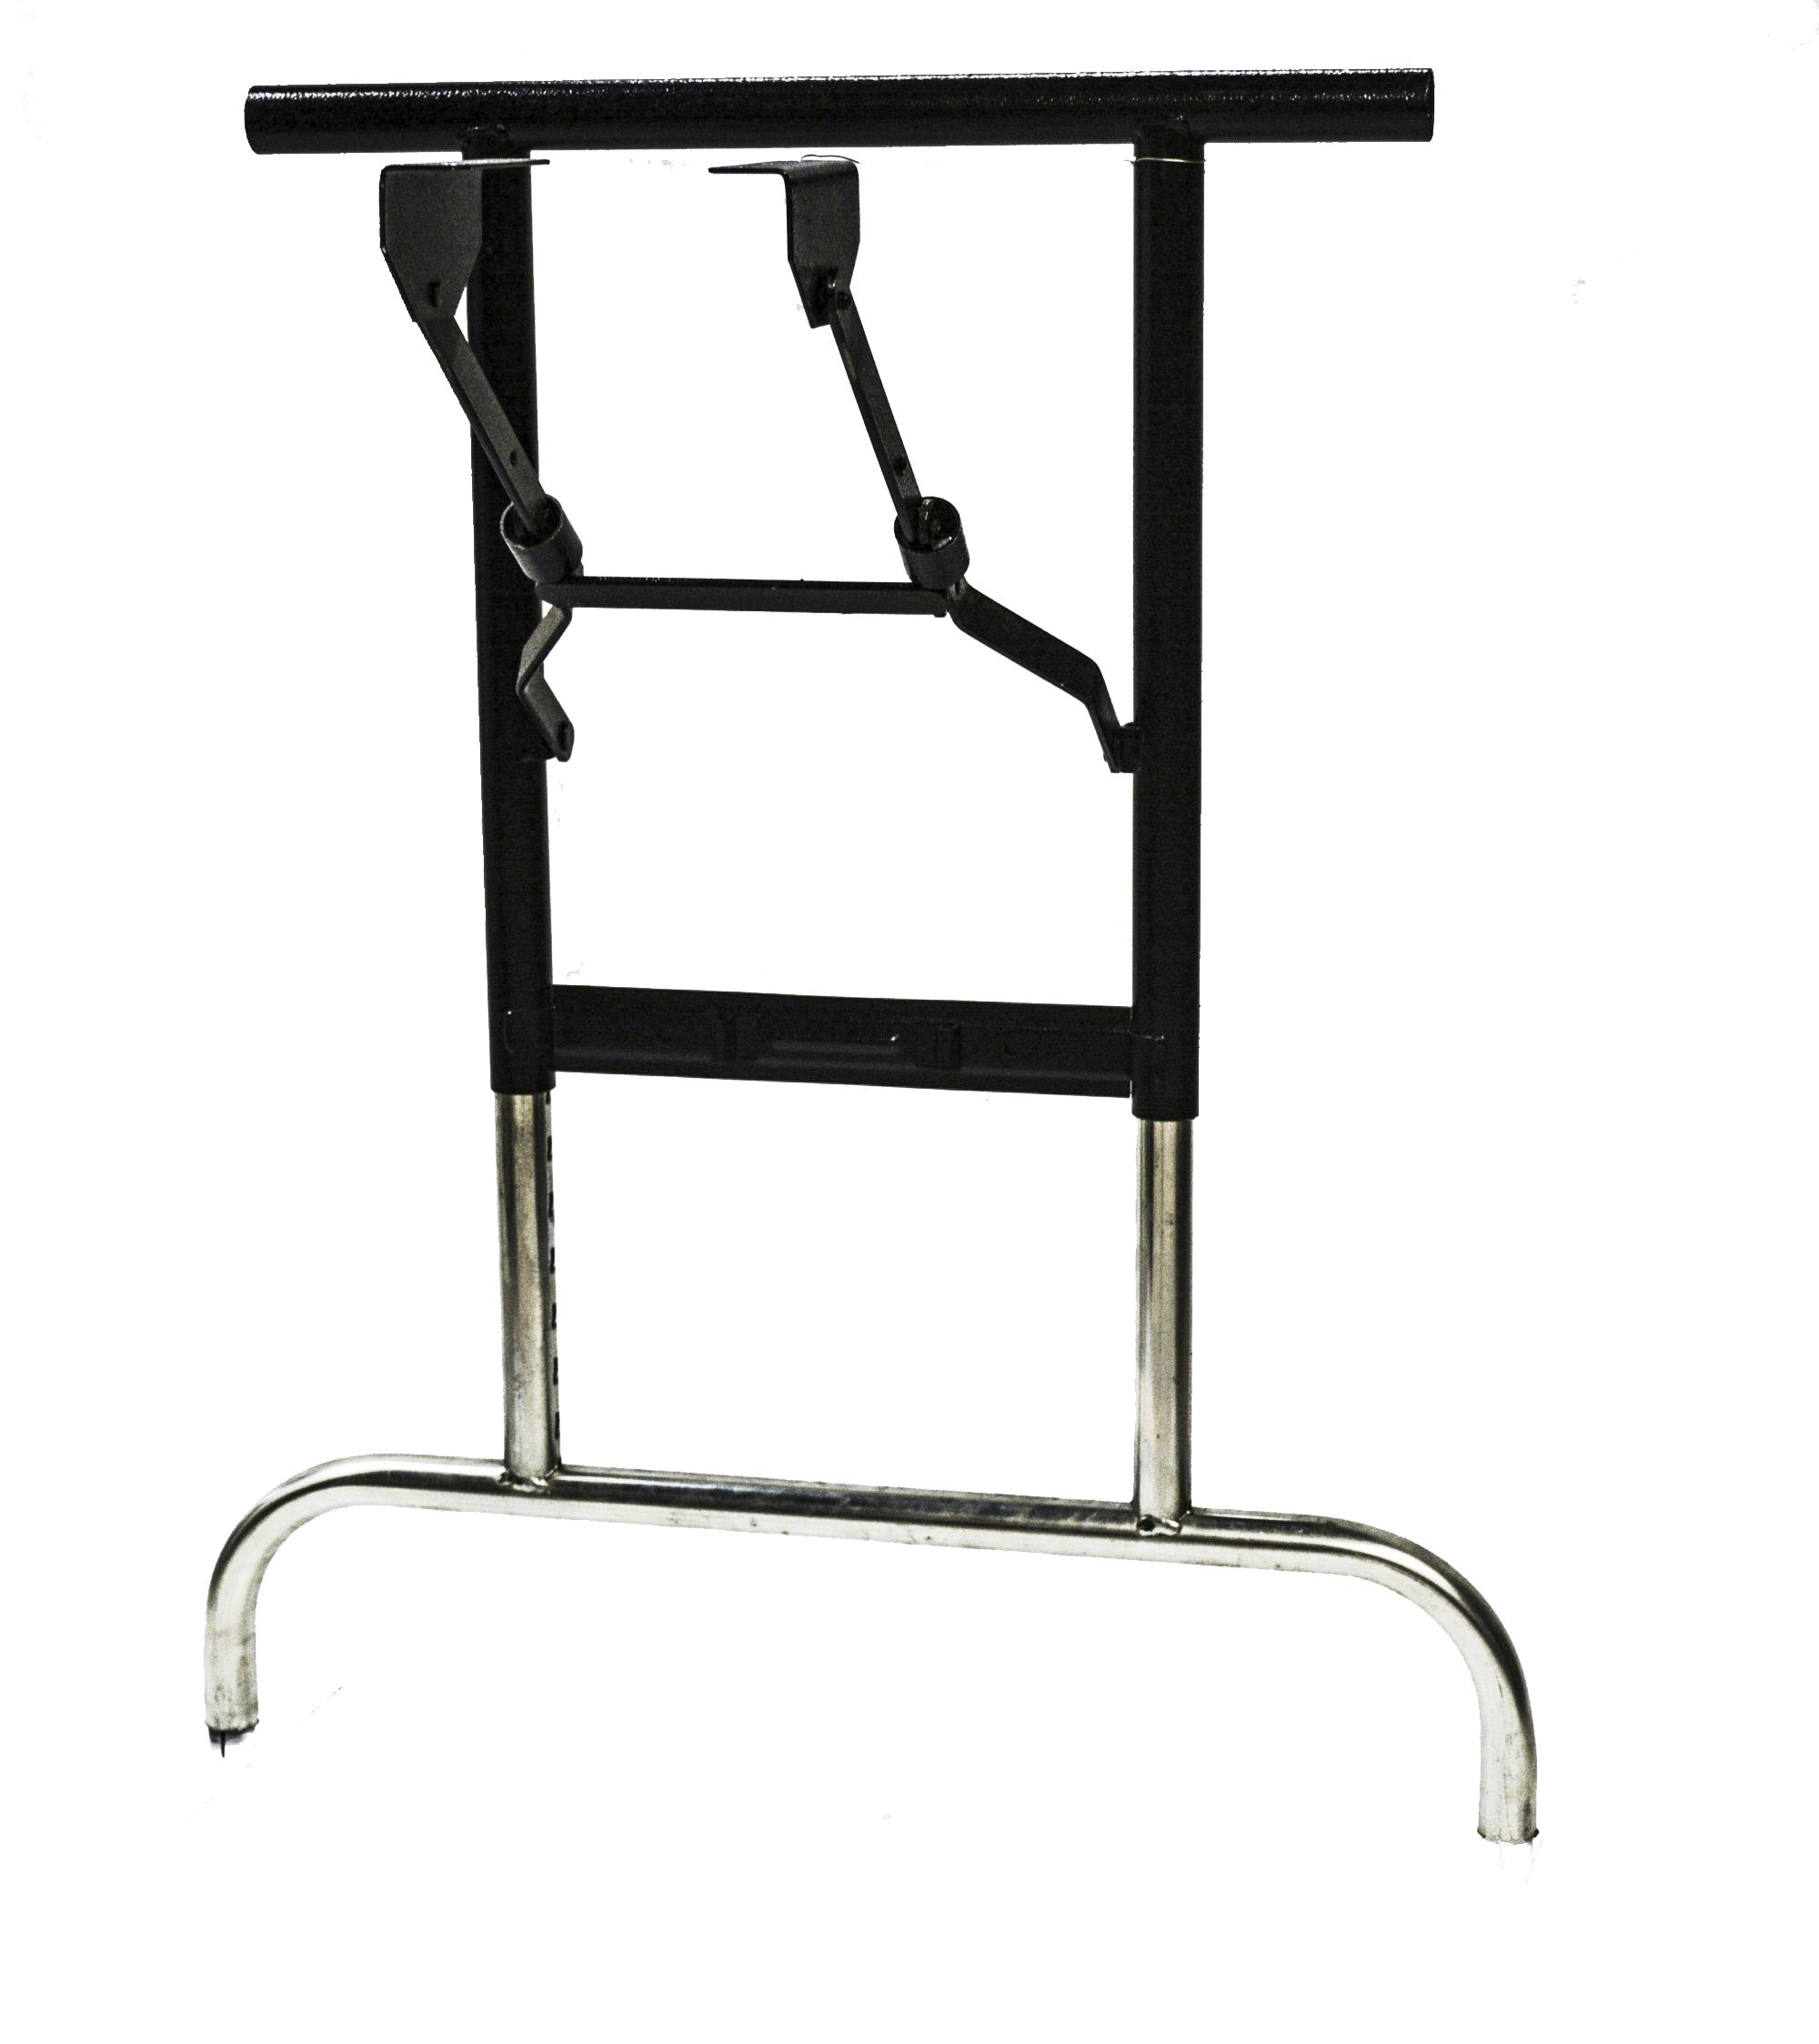 - Folding Table Parts: Adjustable Table Legs